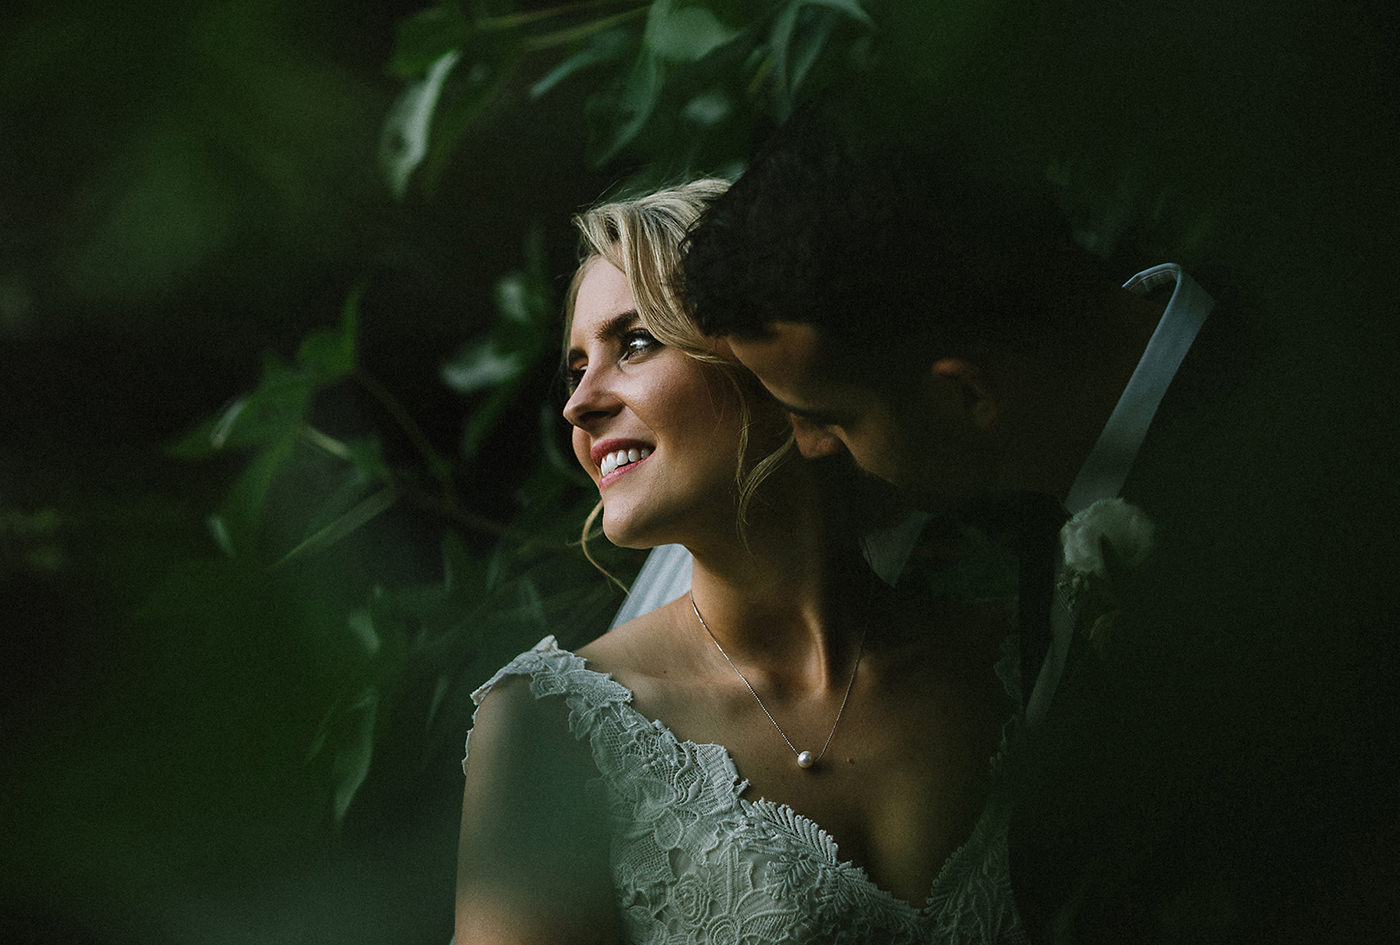 wedding_photographer_nz-00035.jpg